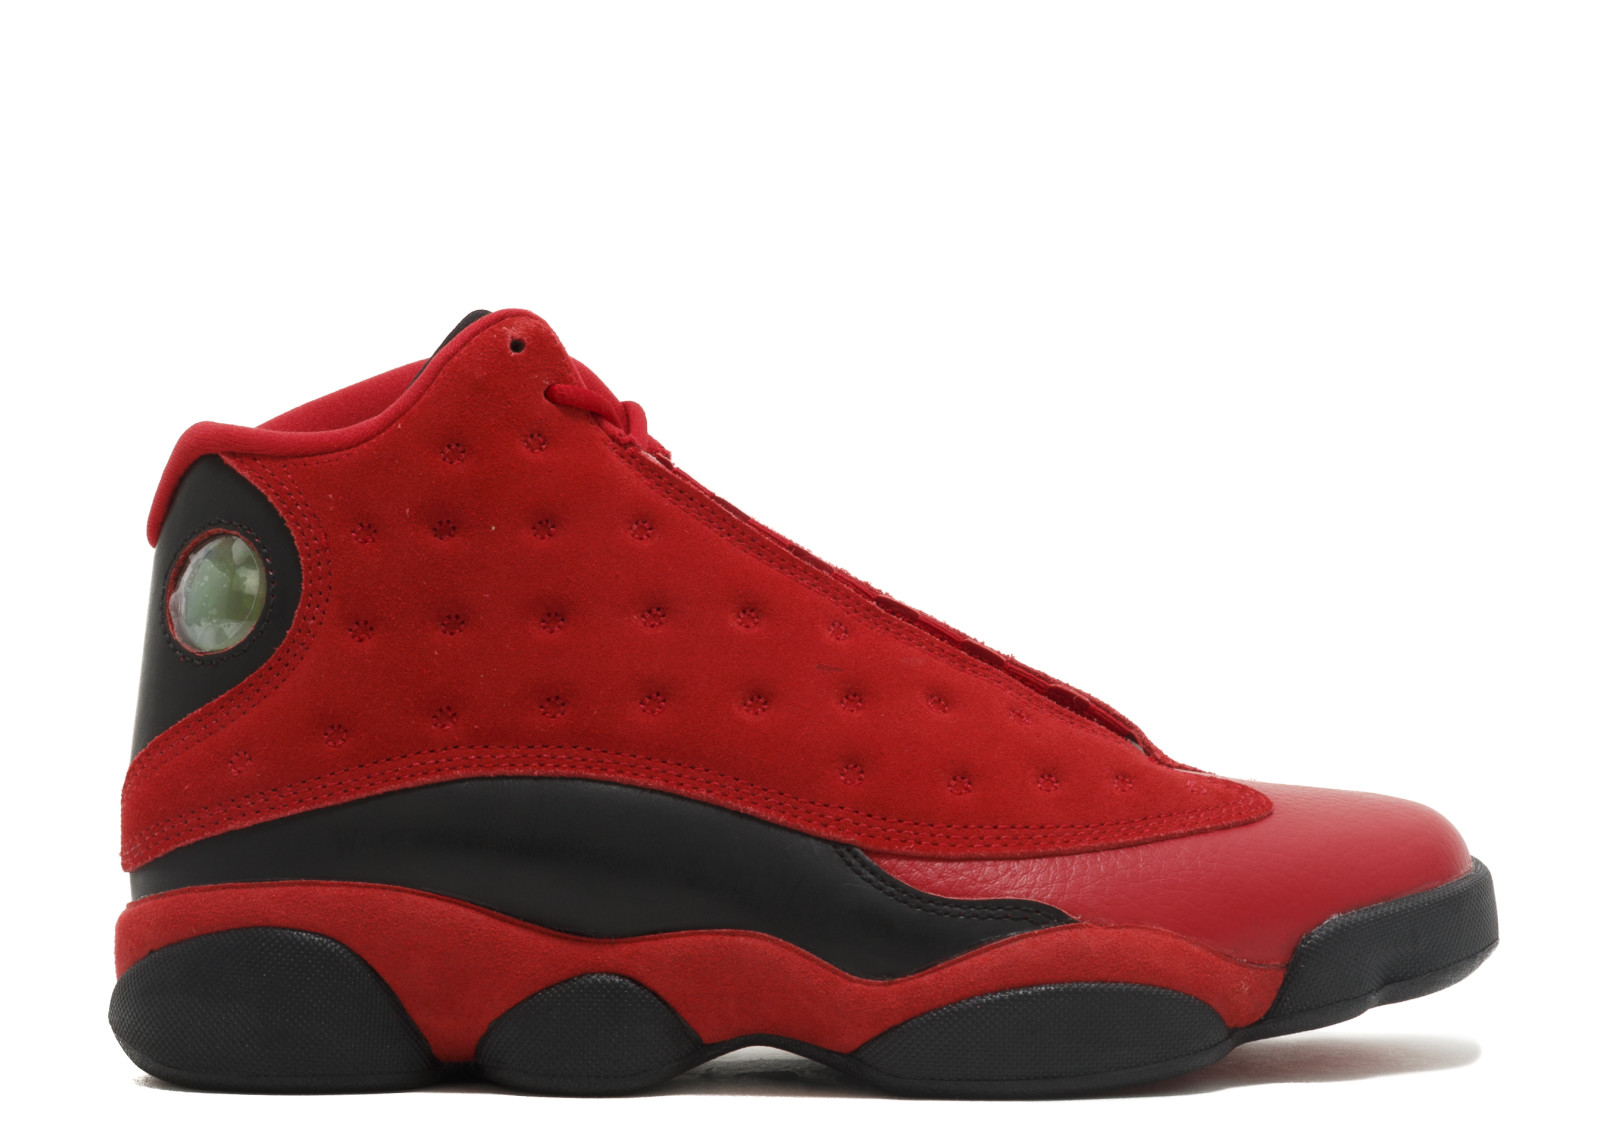 huge selection of 3afe5 d6b7a Air Jordan - Men - Air Jordan 13 Retro Sngl Dy  Single Day  - 888164-601 -  Size 7.5